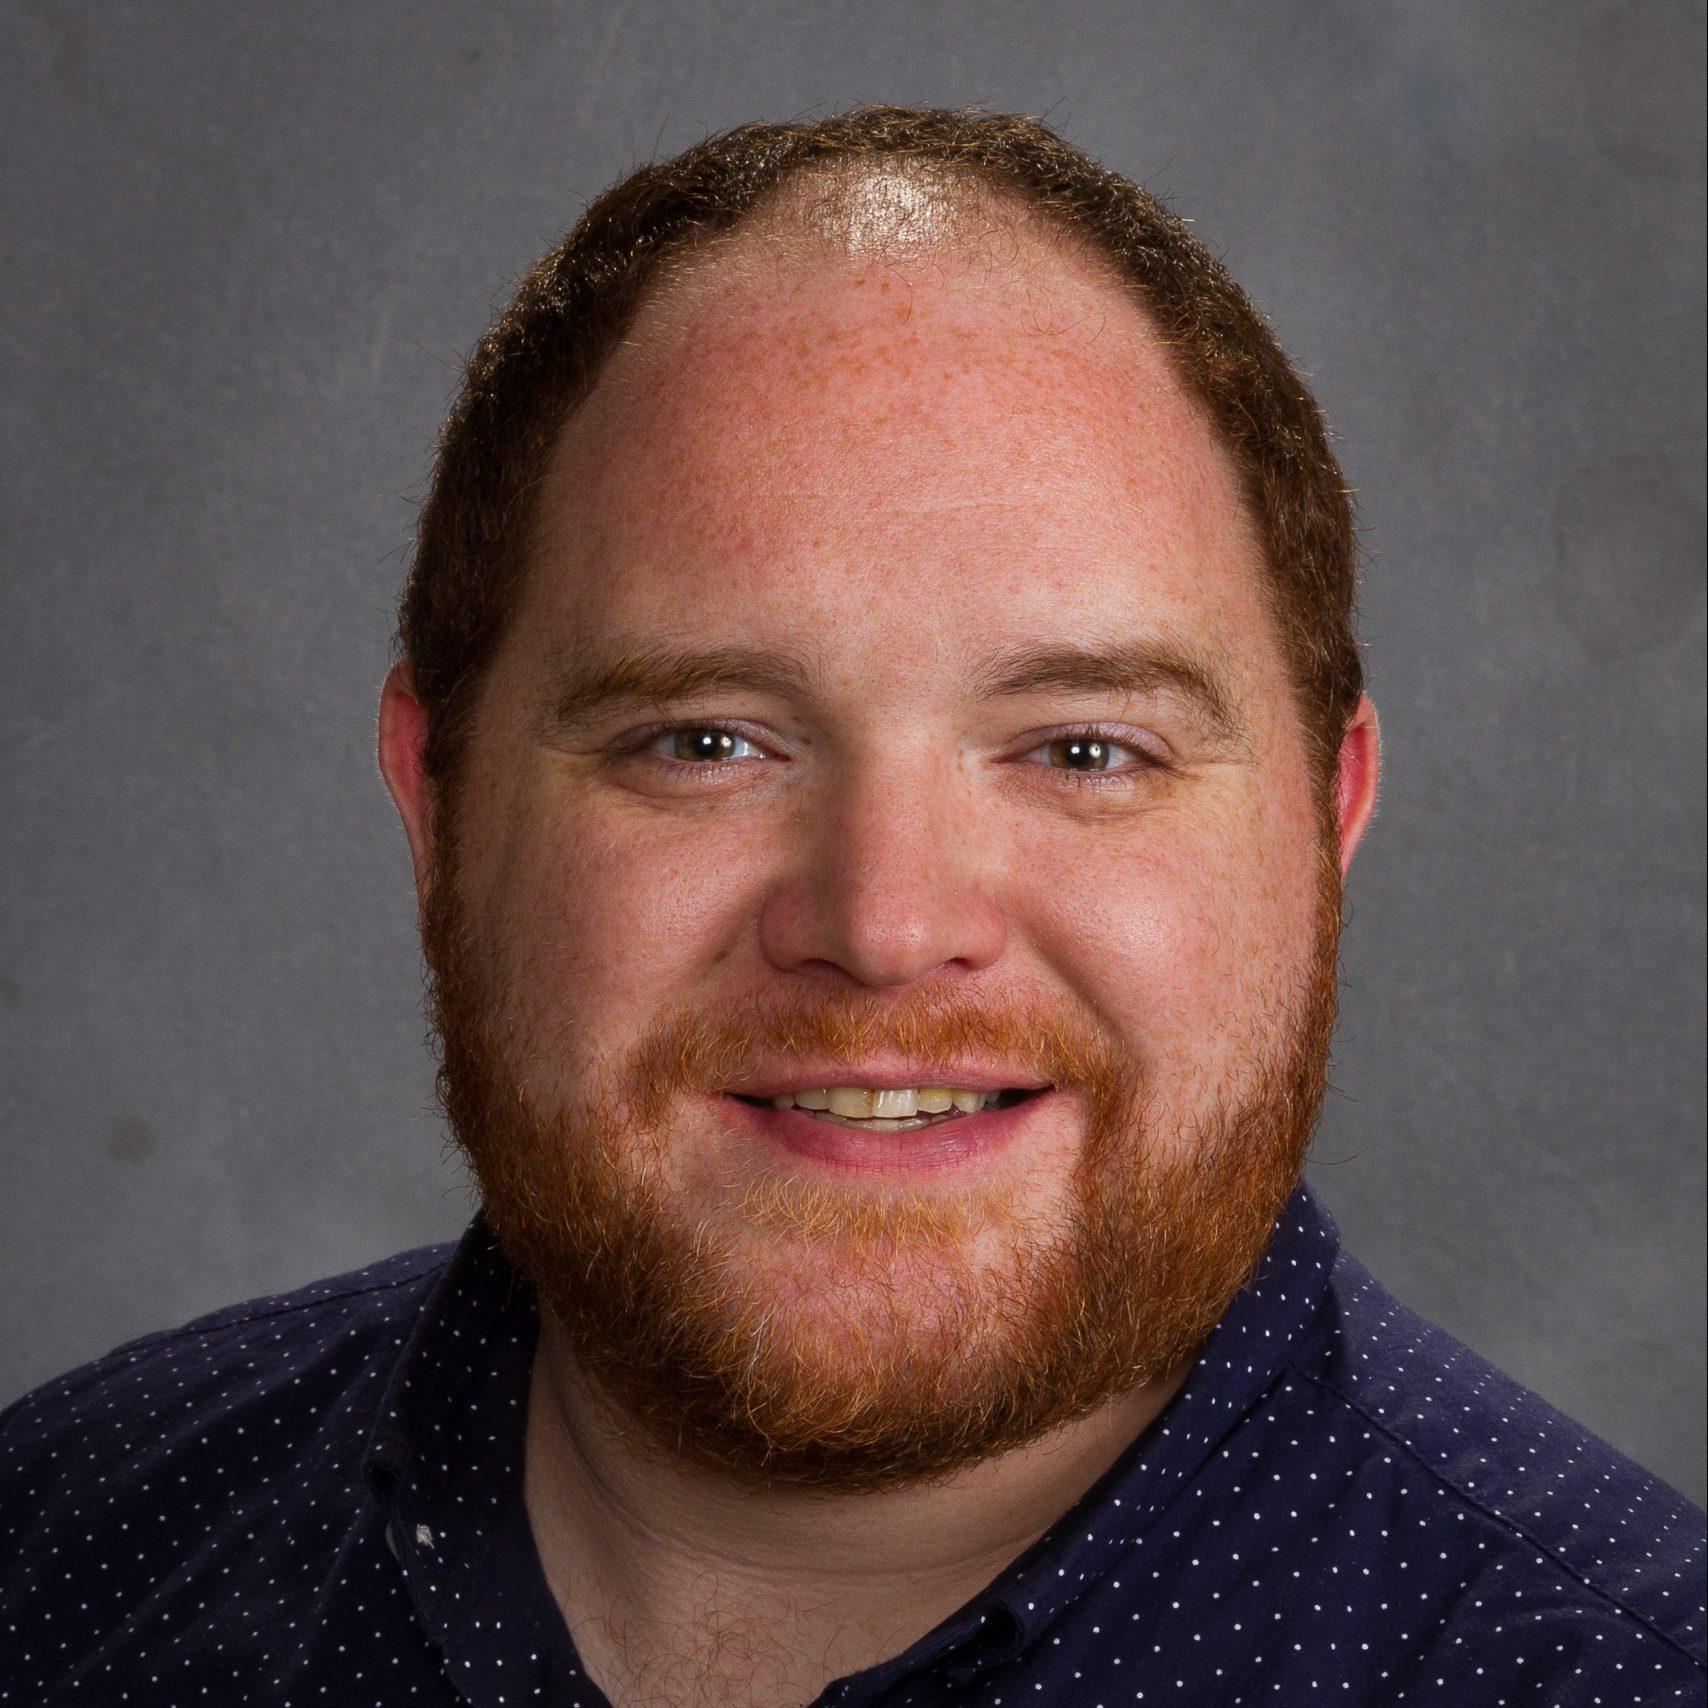 Nick Osenberg